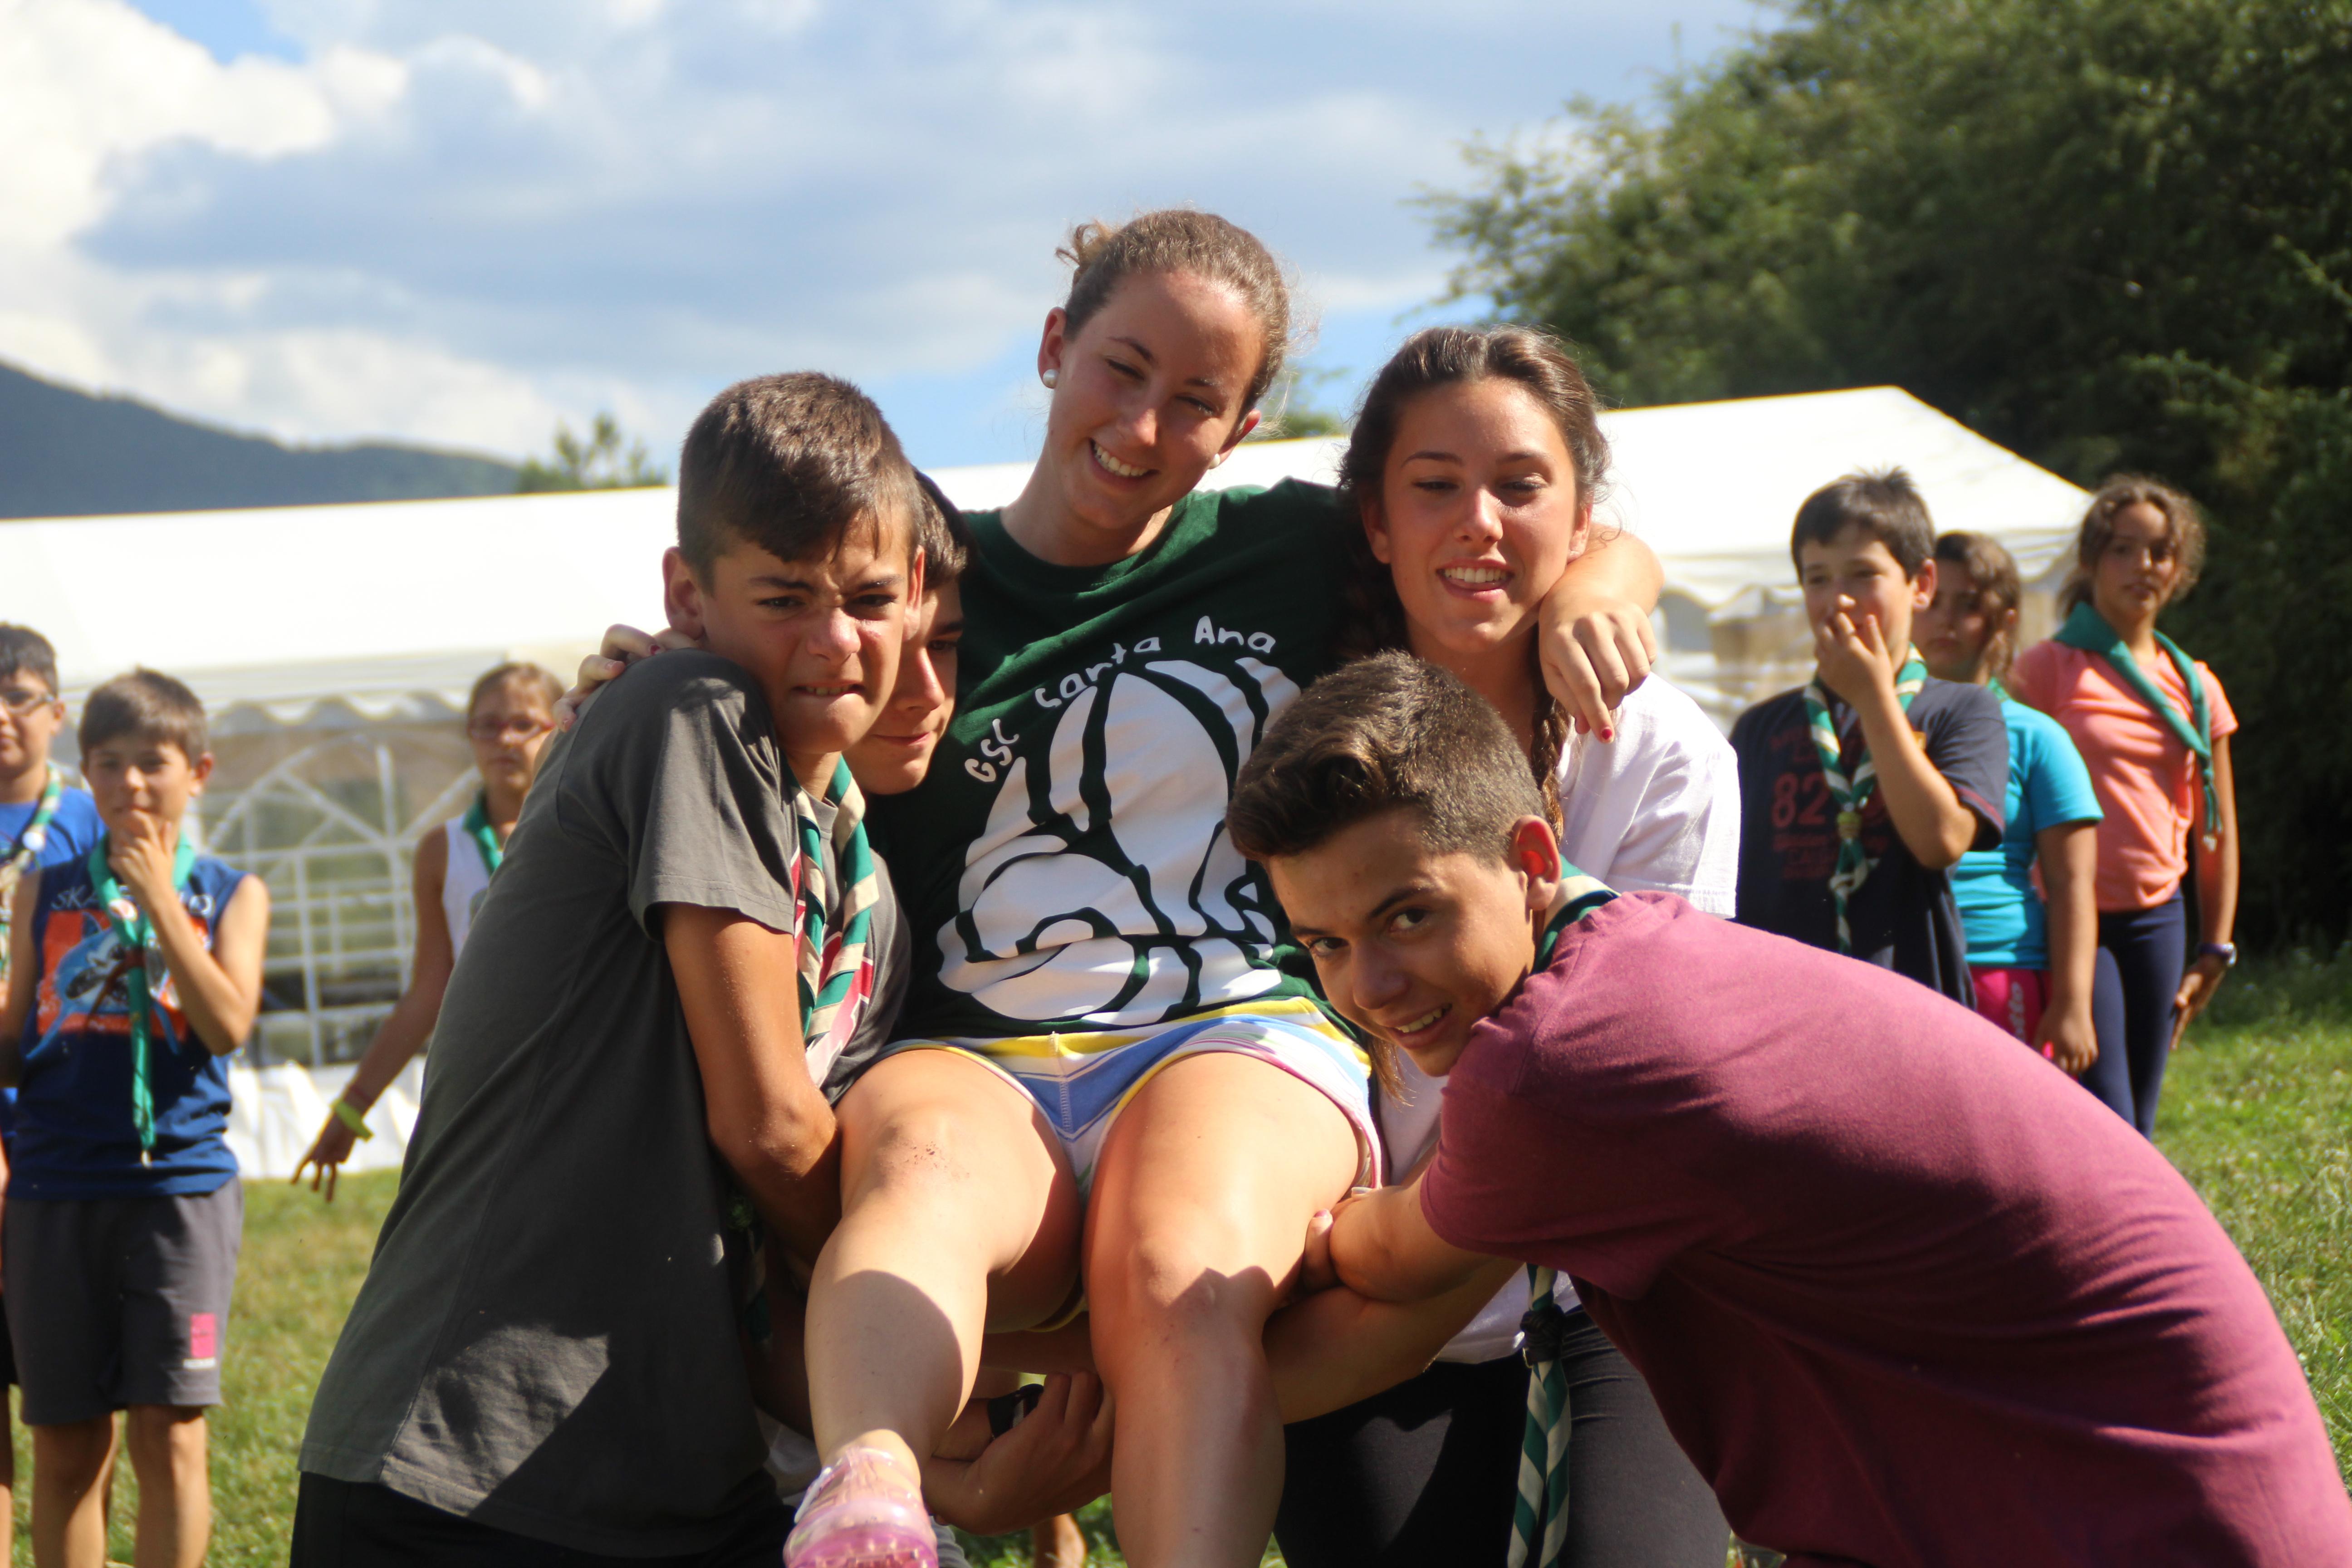 15-16 - Grupo - Campamento de verano - P210